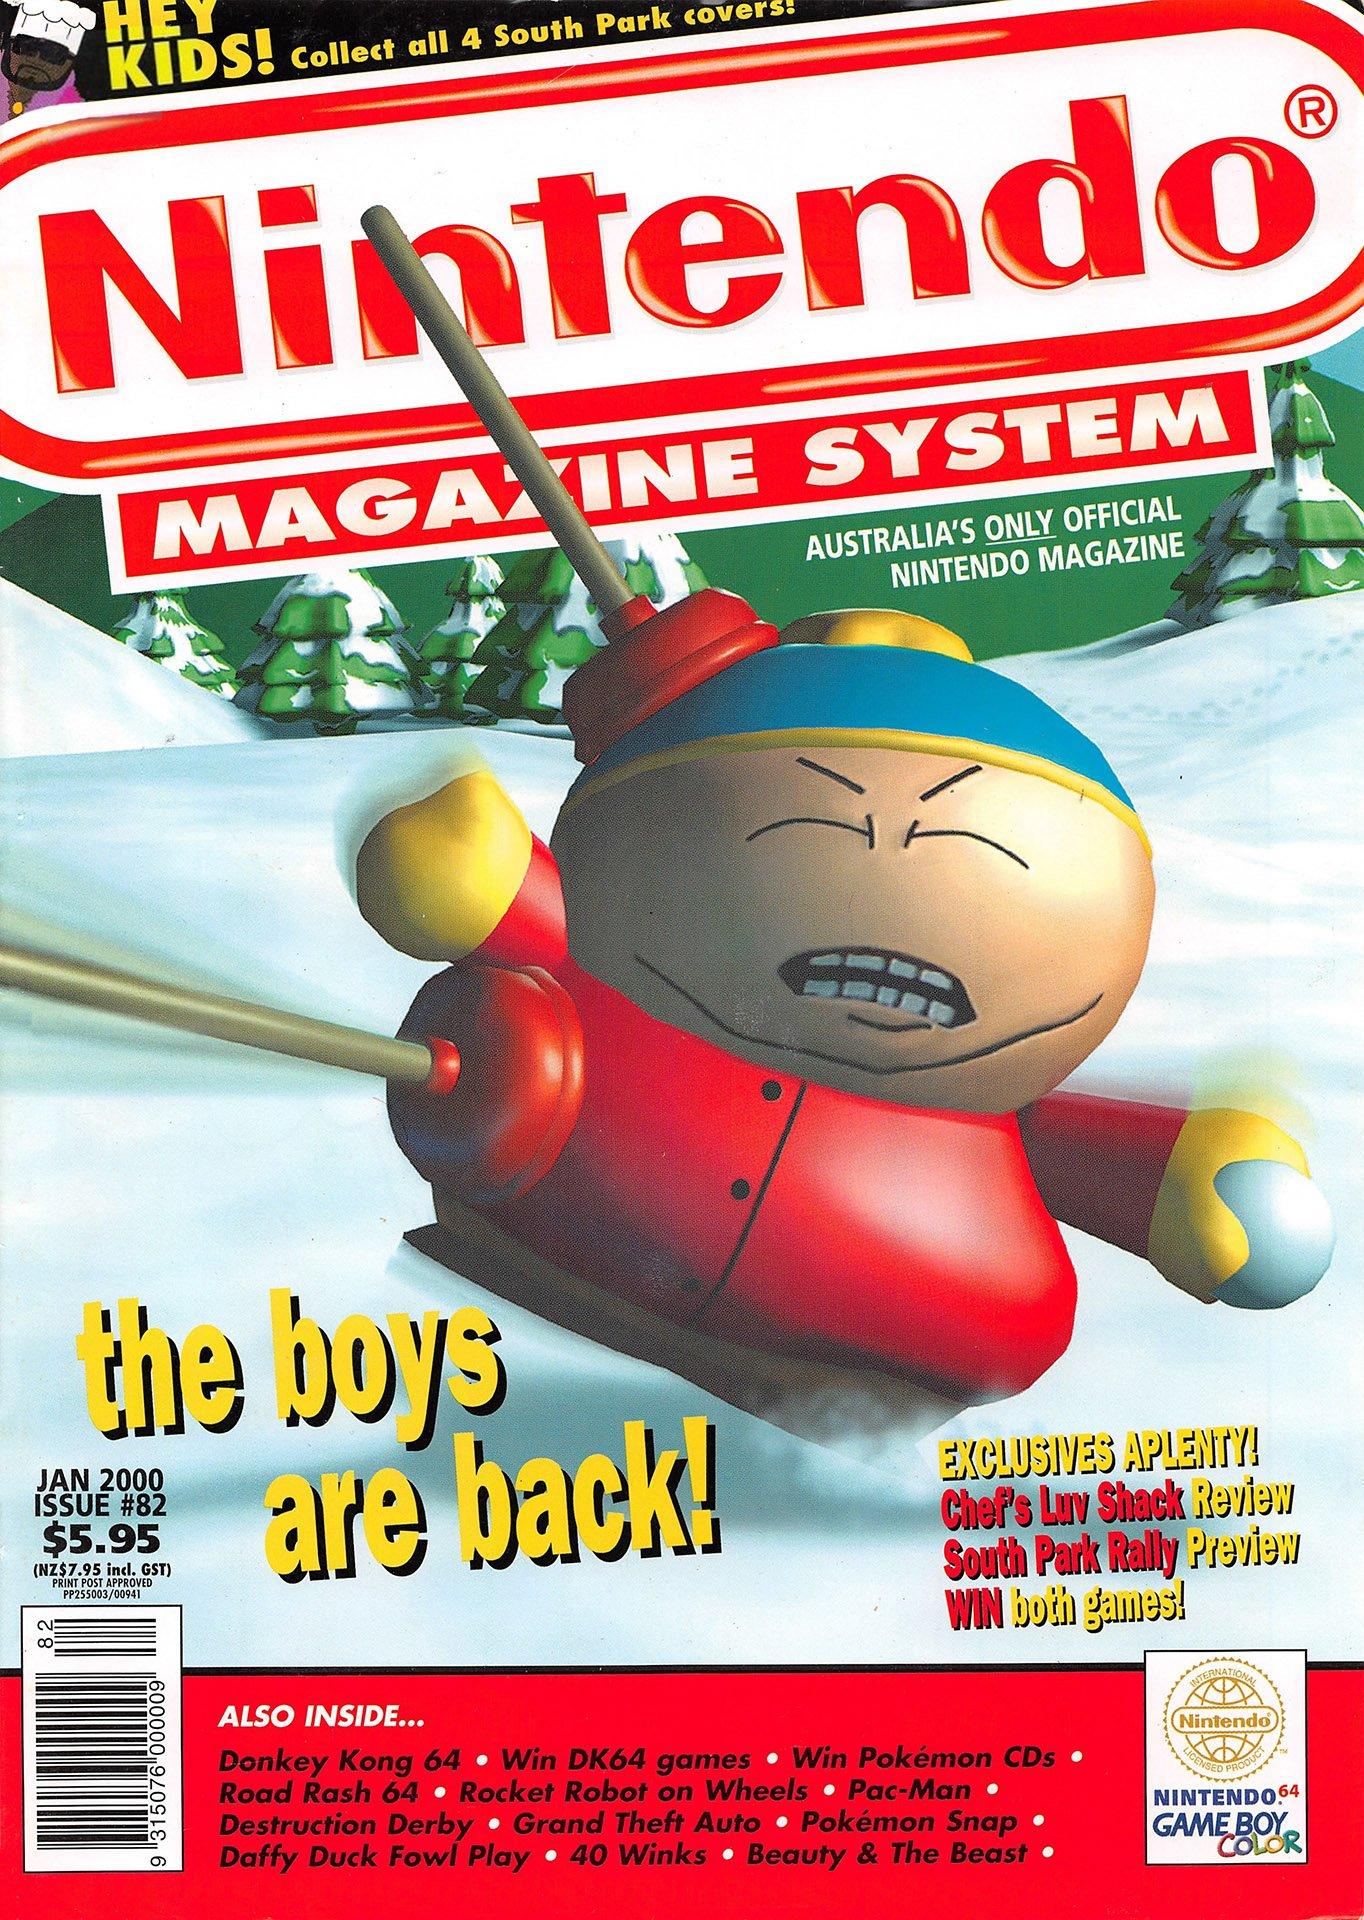 Nintendo Magazine System (AUS) 082b (January 2000)